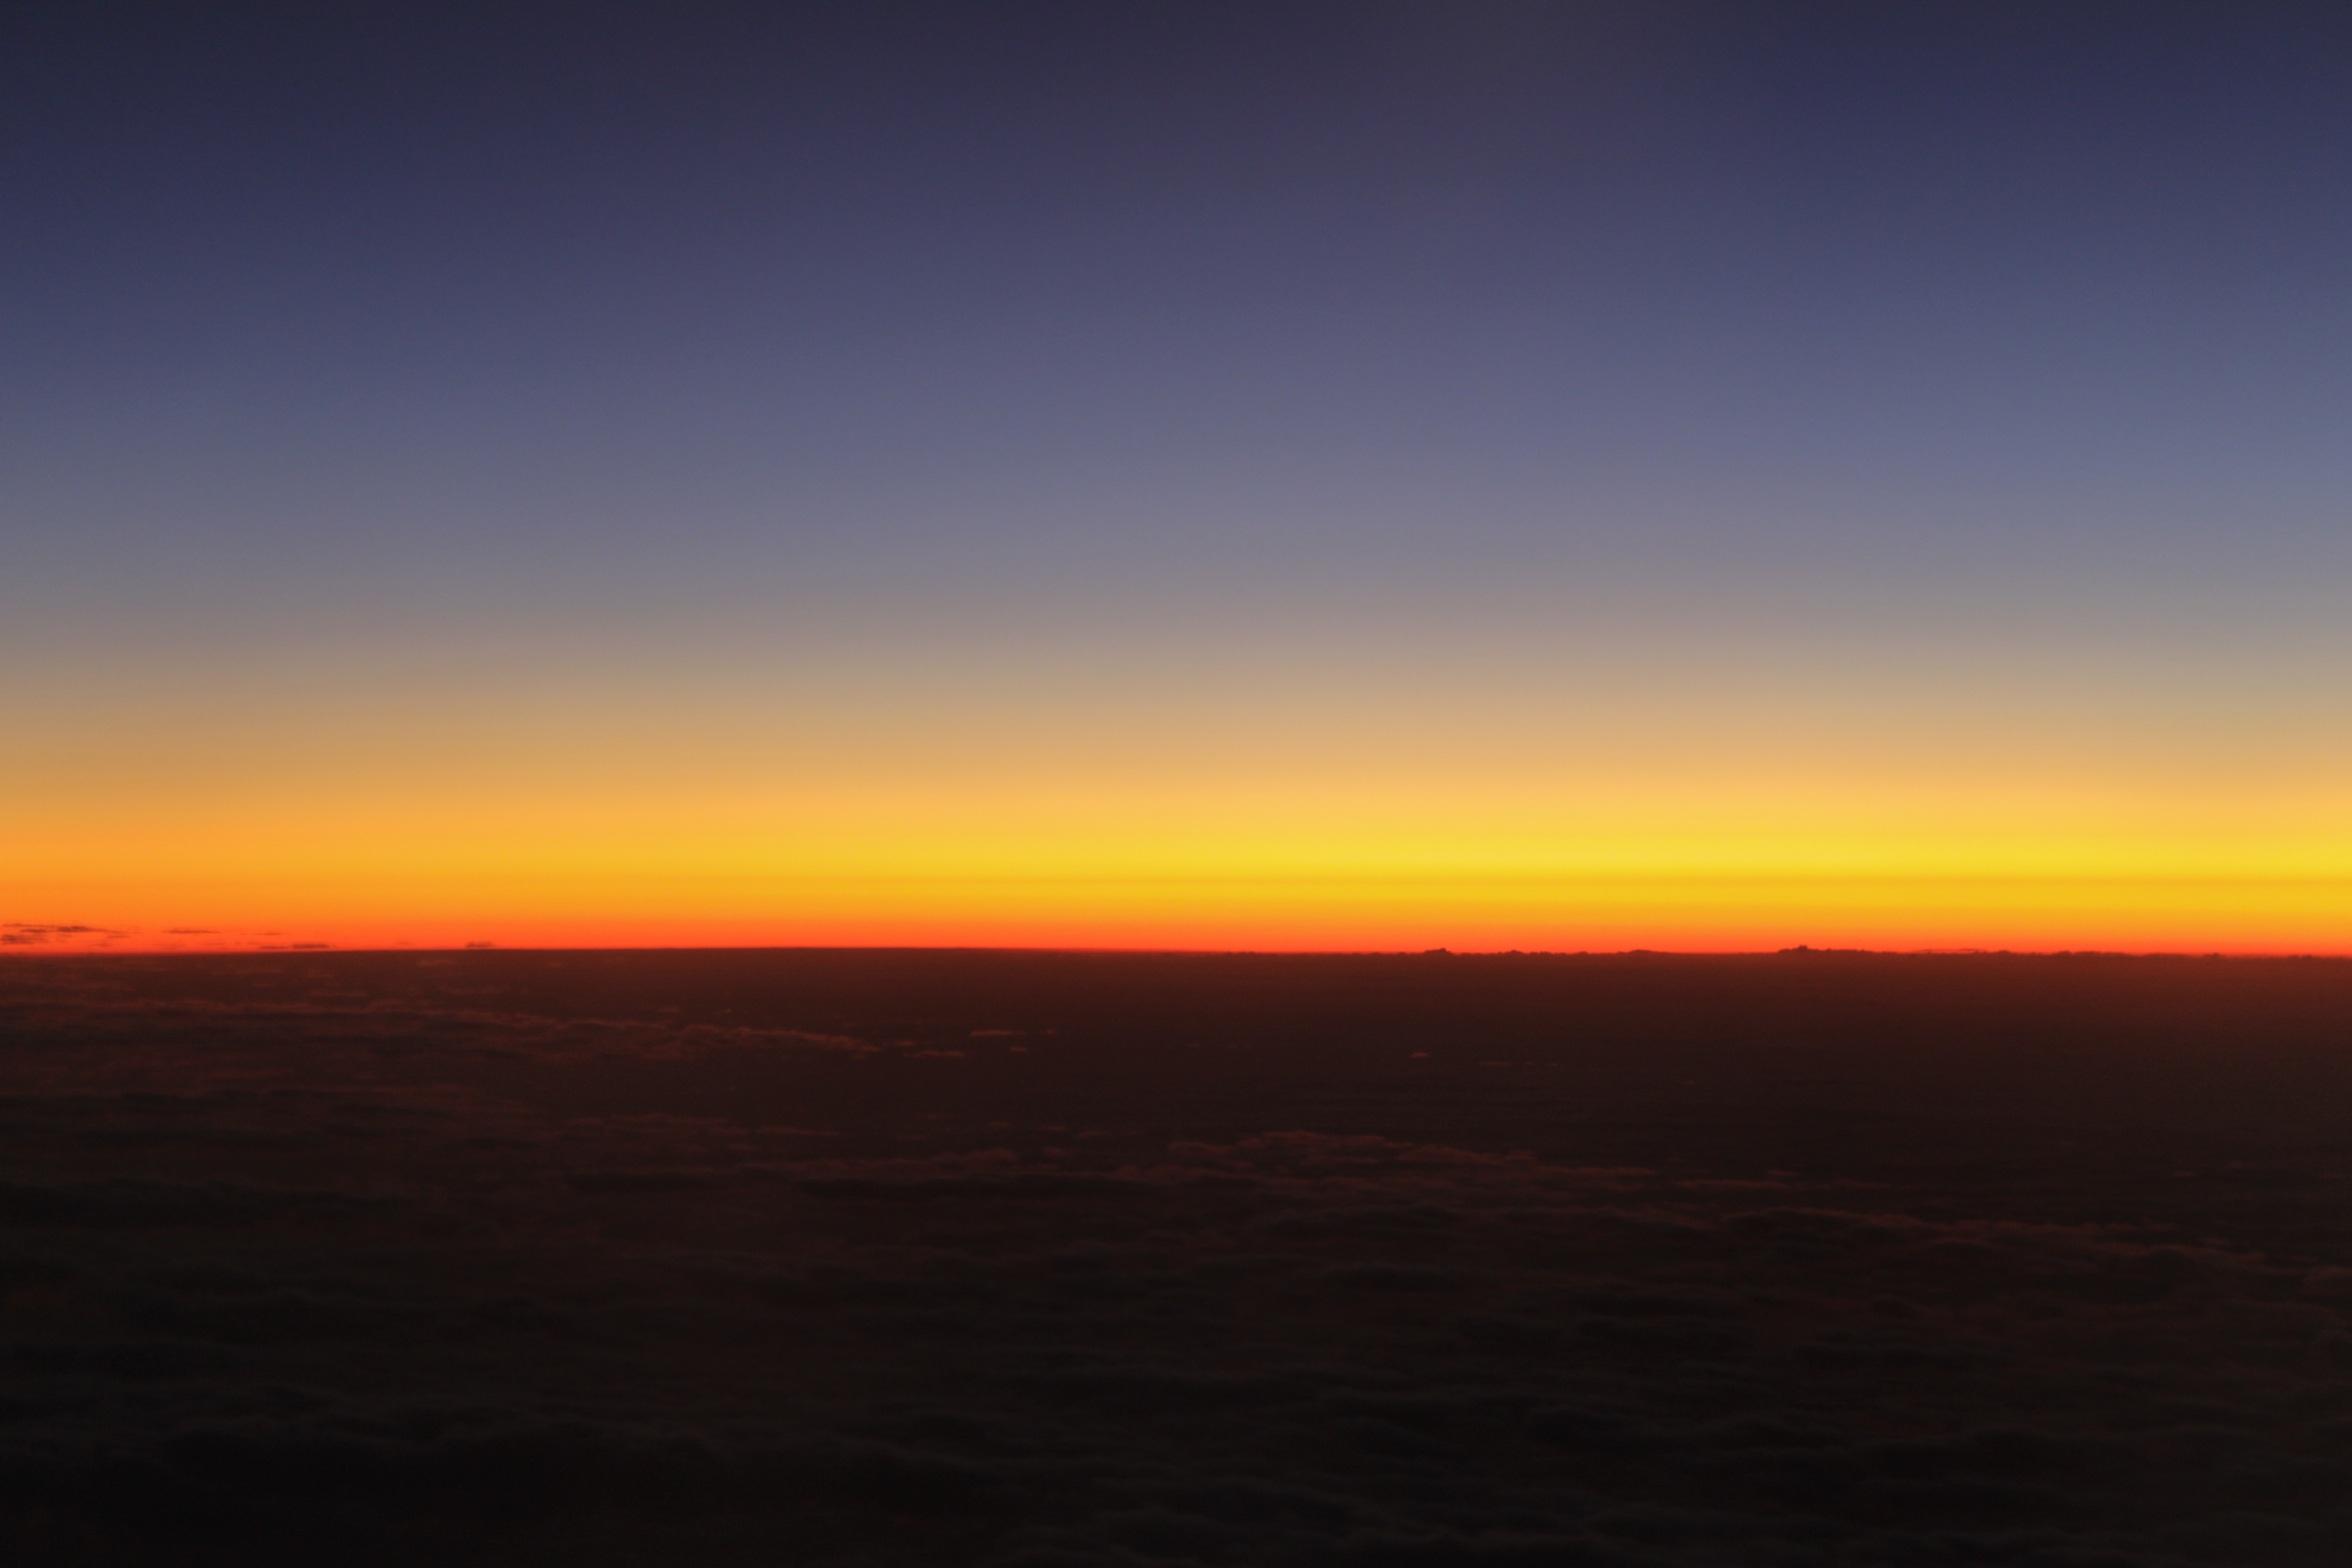 curiosity sunrise sunset times - HD2352×1568